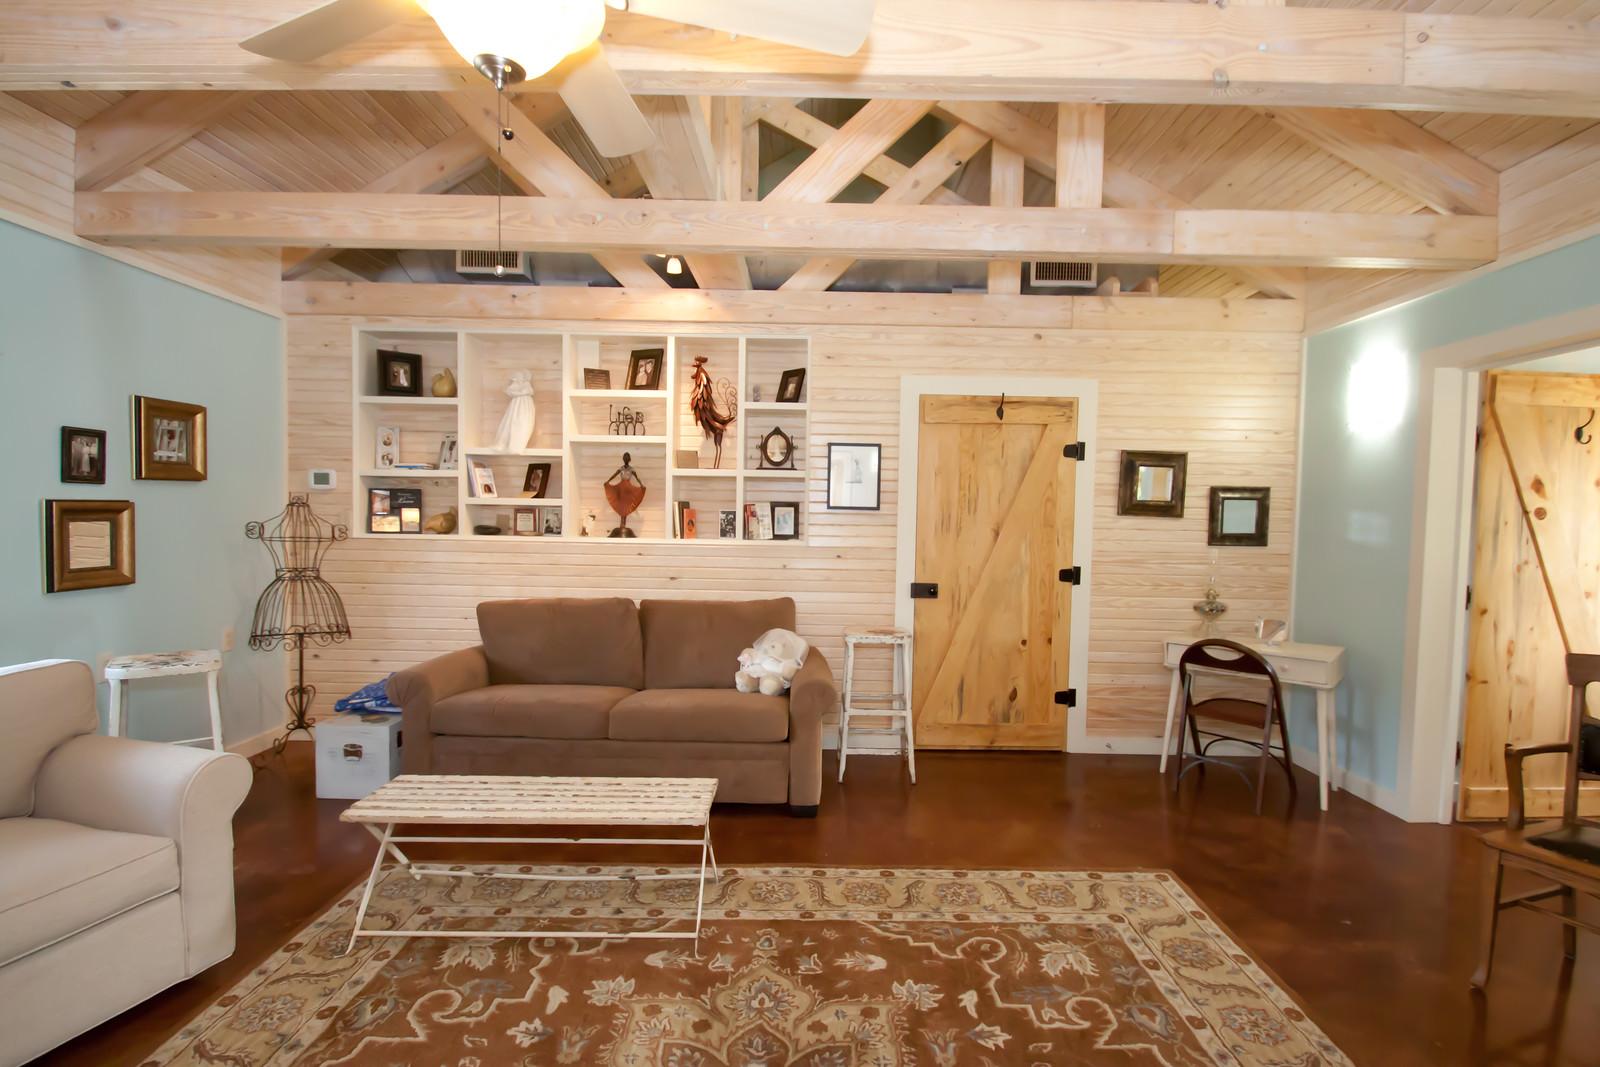 Property-63-Inside Bride's House-X3